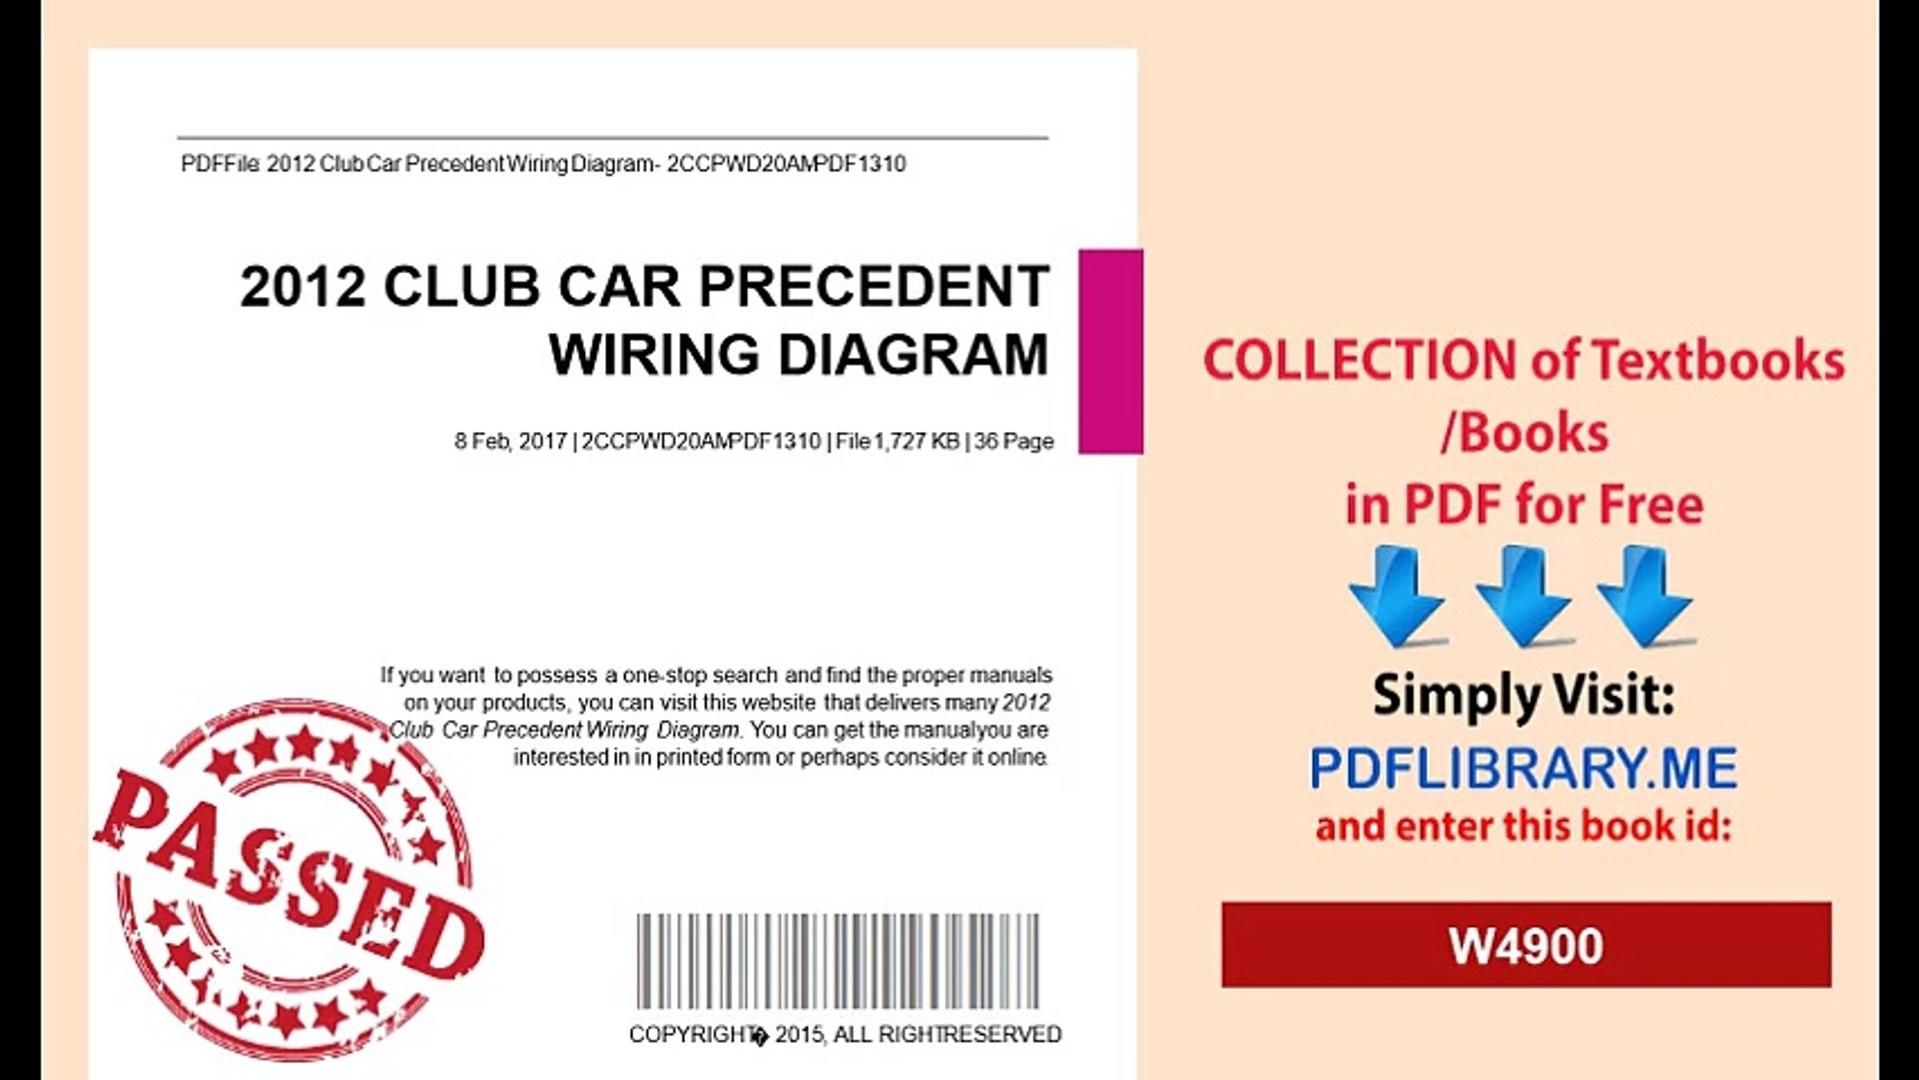 Awe Inspiring 2012 Club Car Precedent Wiring Diagram Video Dailymotion Wiring Cloud Licukshollocom